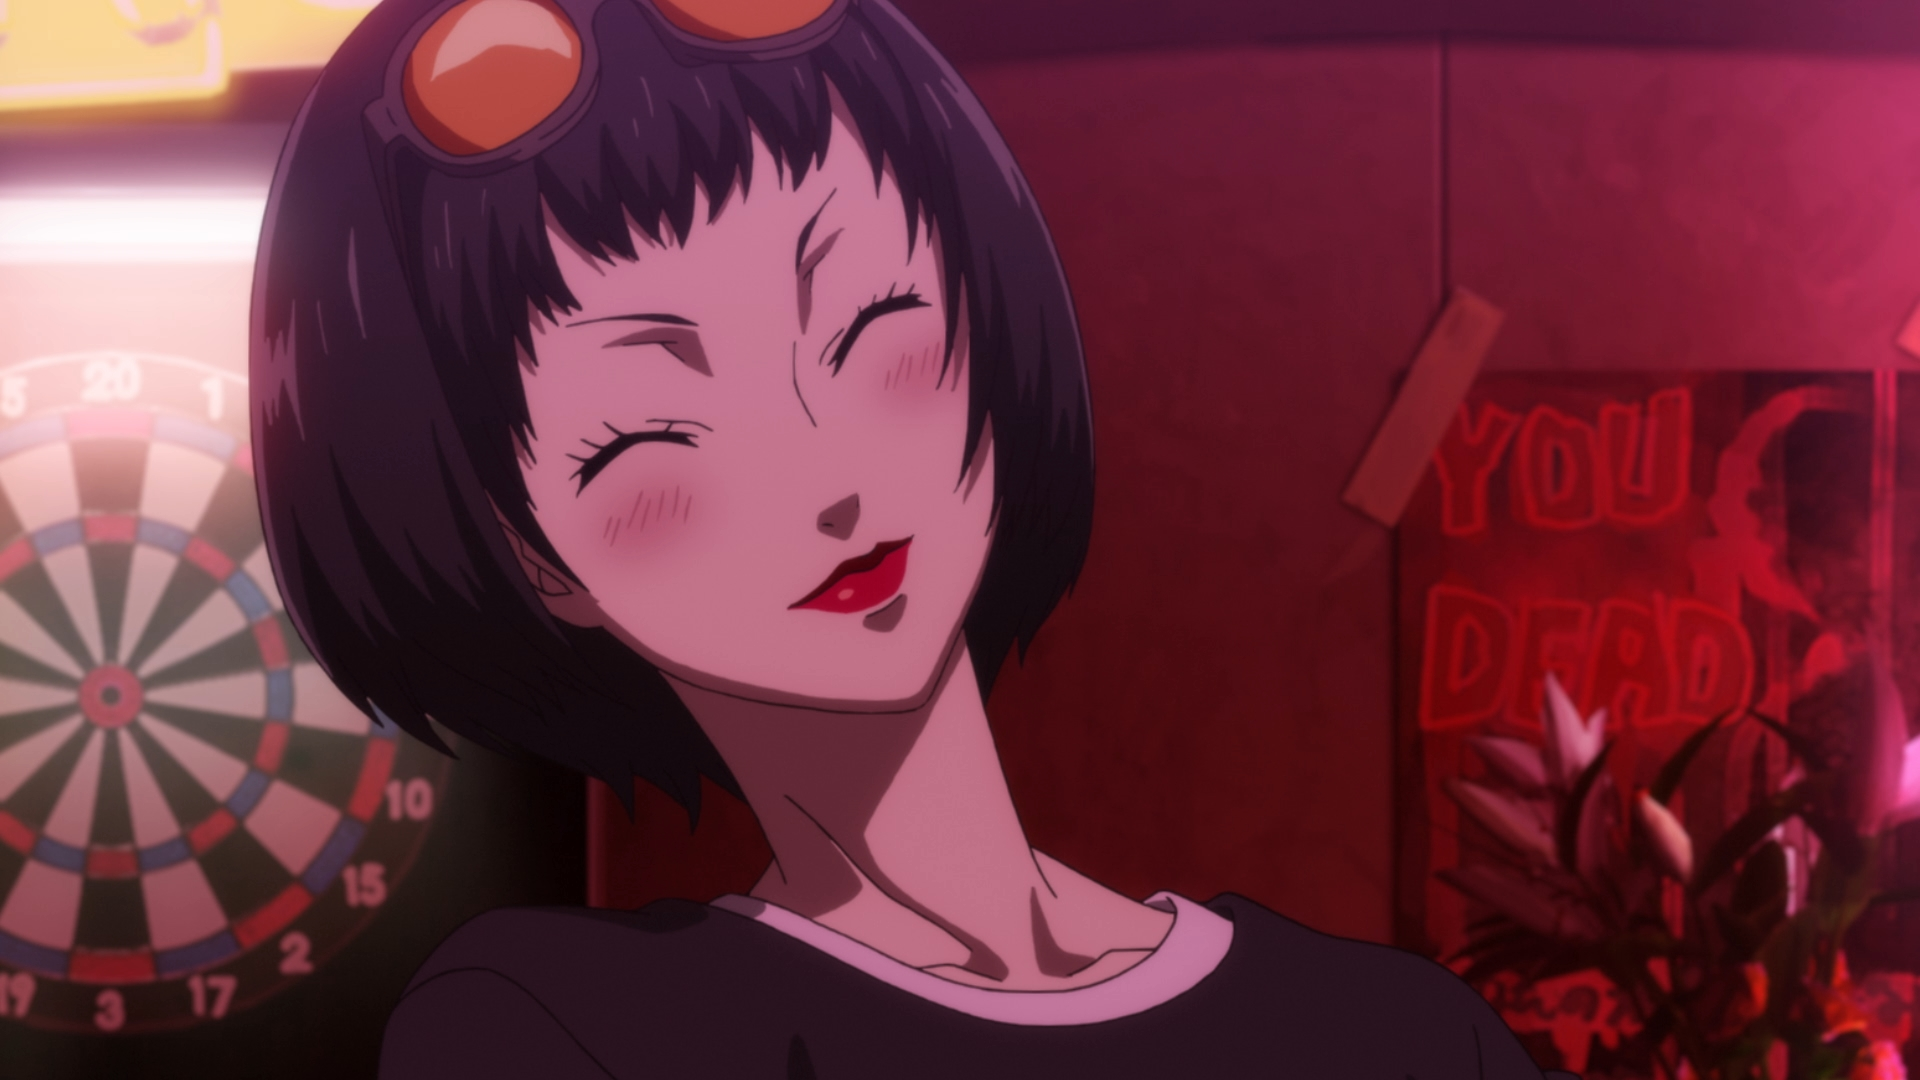 TVアニメ『ペルソナ5』第10話先行カット&あらすじ公開! 蓮、竜司、杏の三人はテレビ局で高校生名探偵・明智吾郎と遭遇するの画像-6